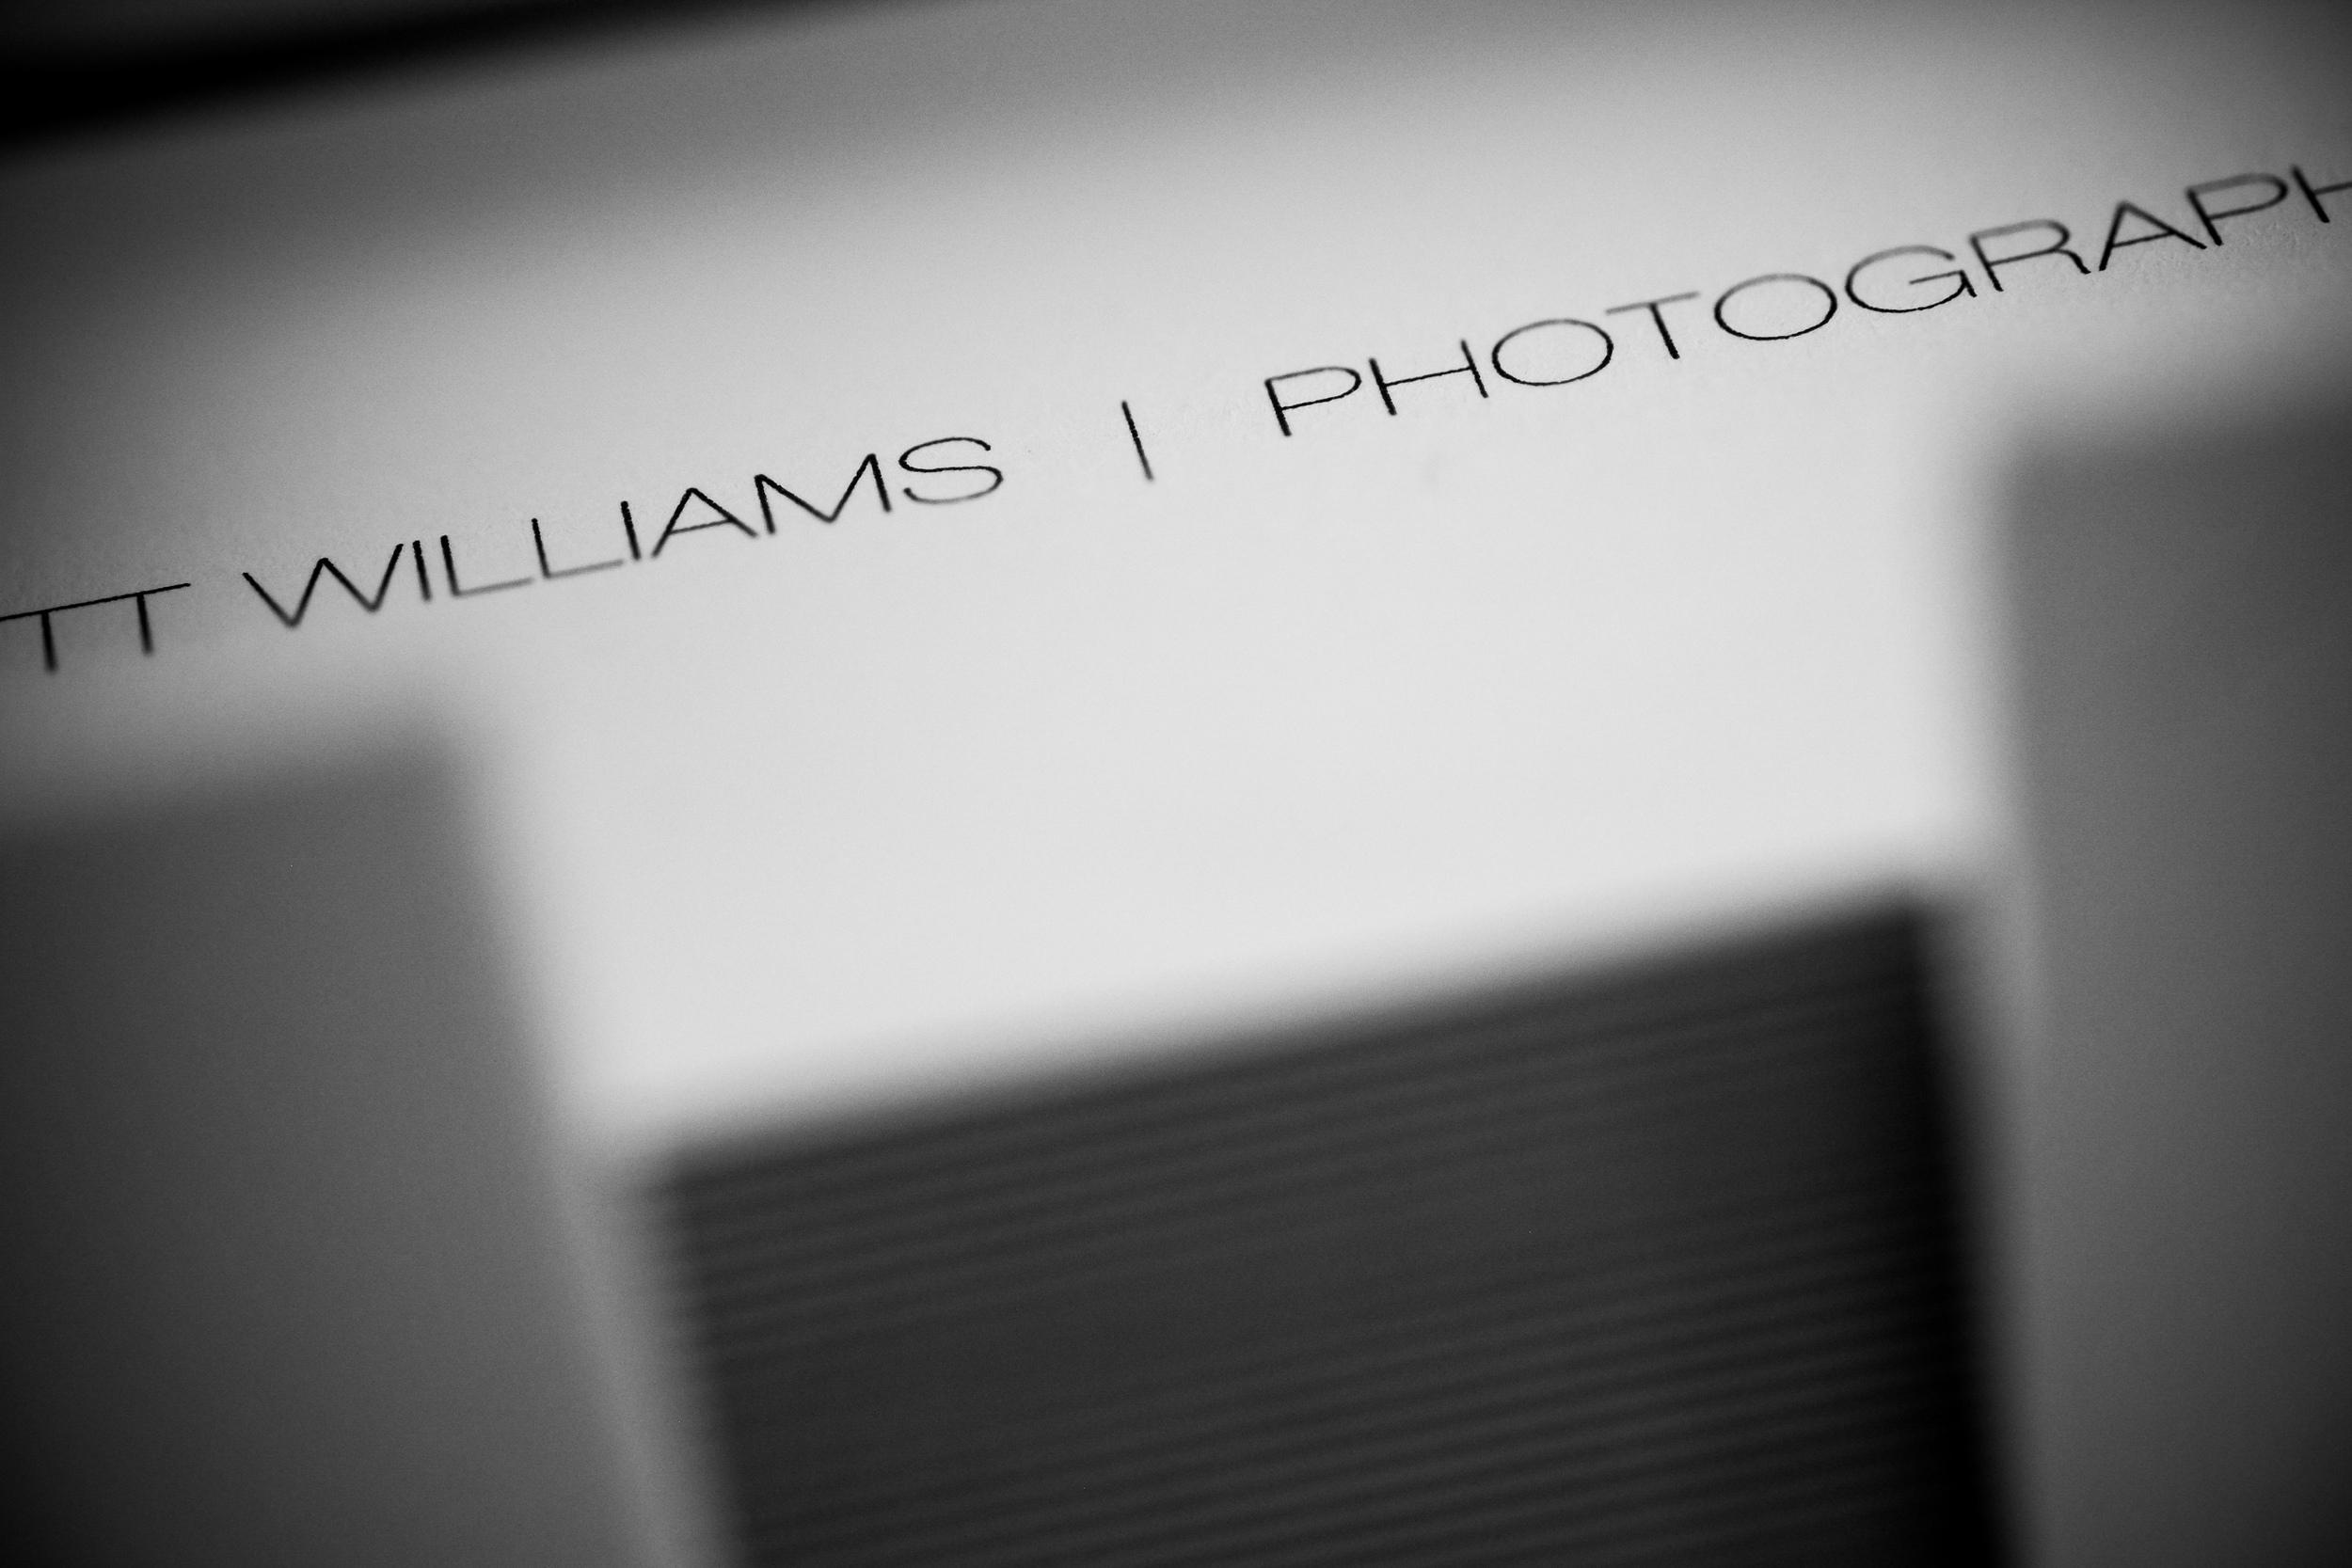 scott-williams-photographer-business-cards-001.jpg